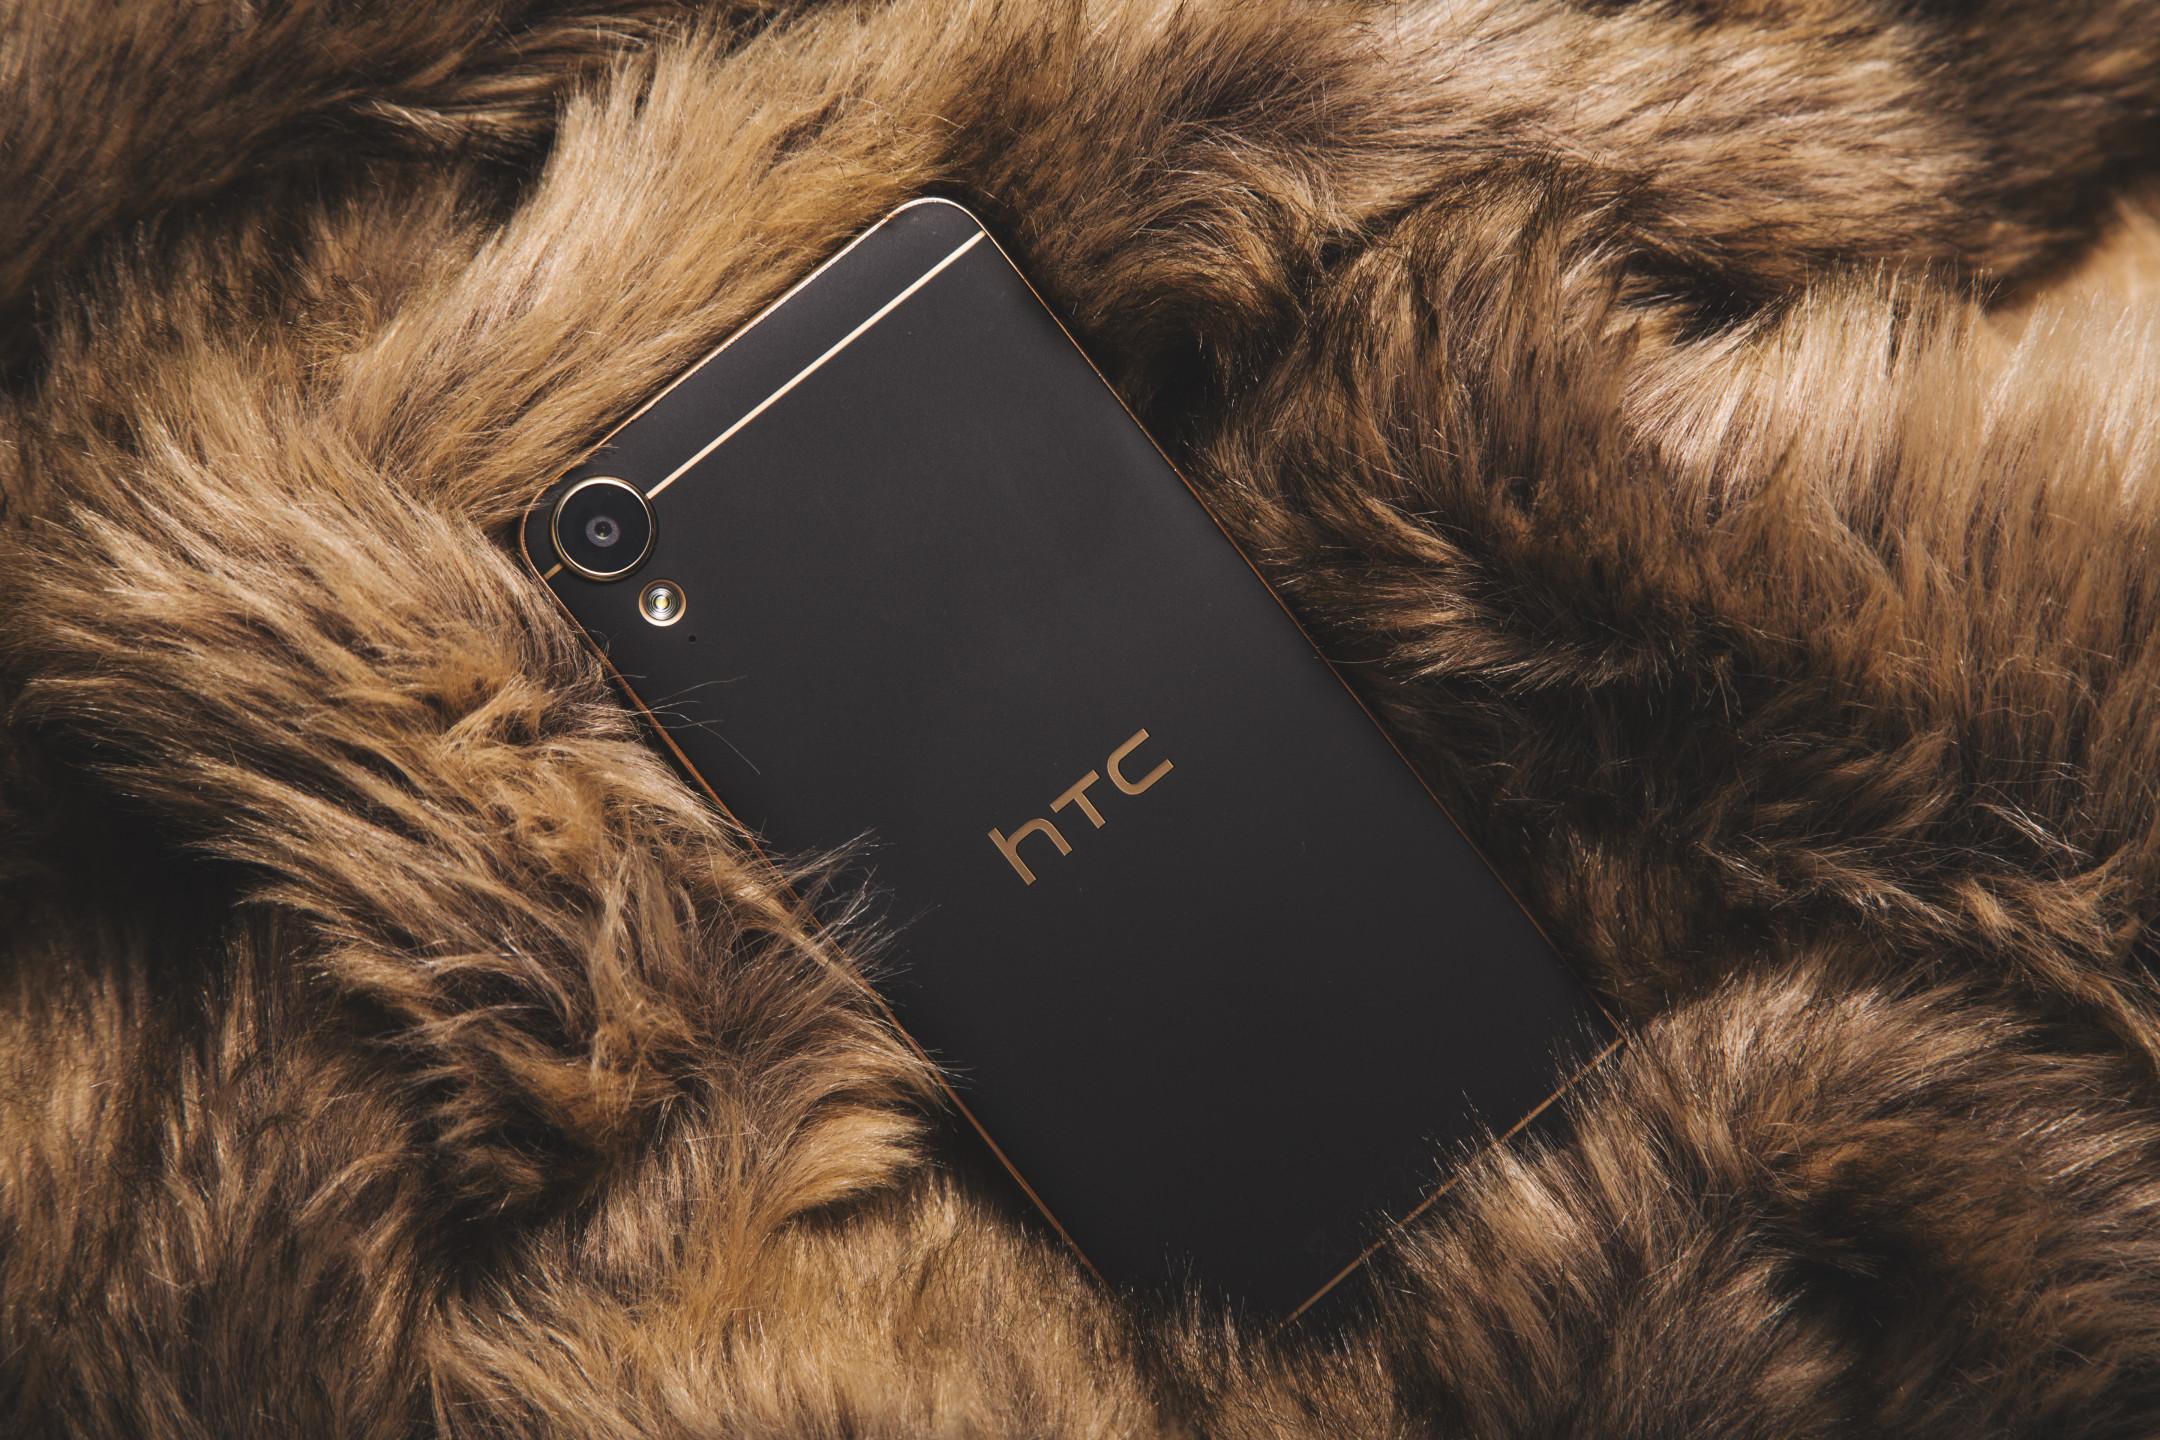 HTC Blockchain smartphone pairs with Opera to dominate the crypto market